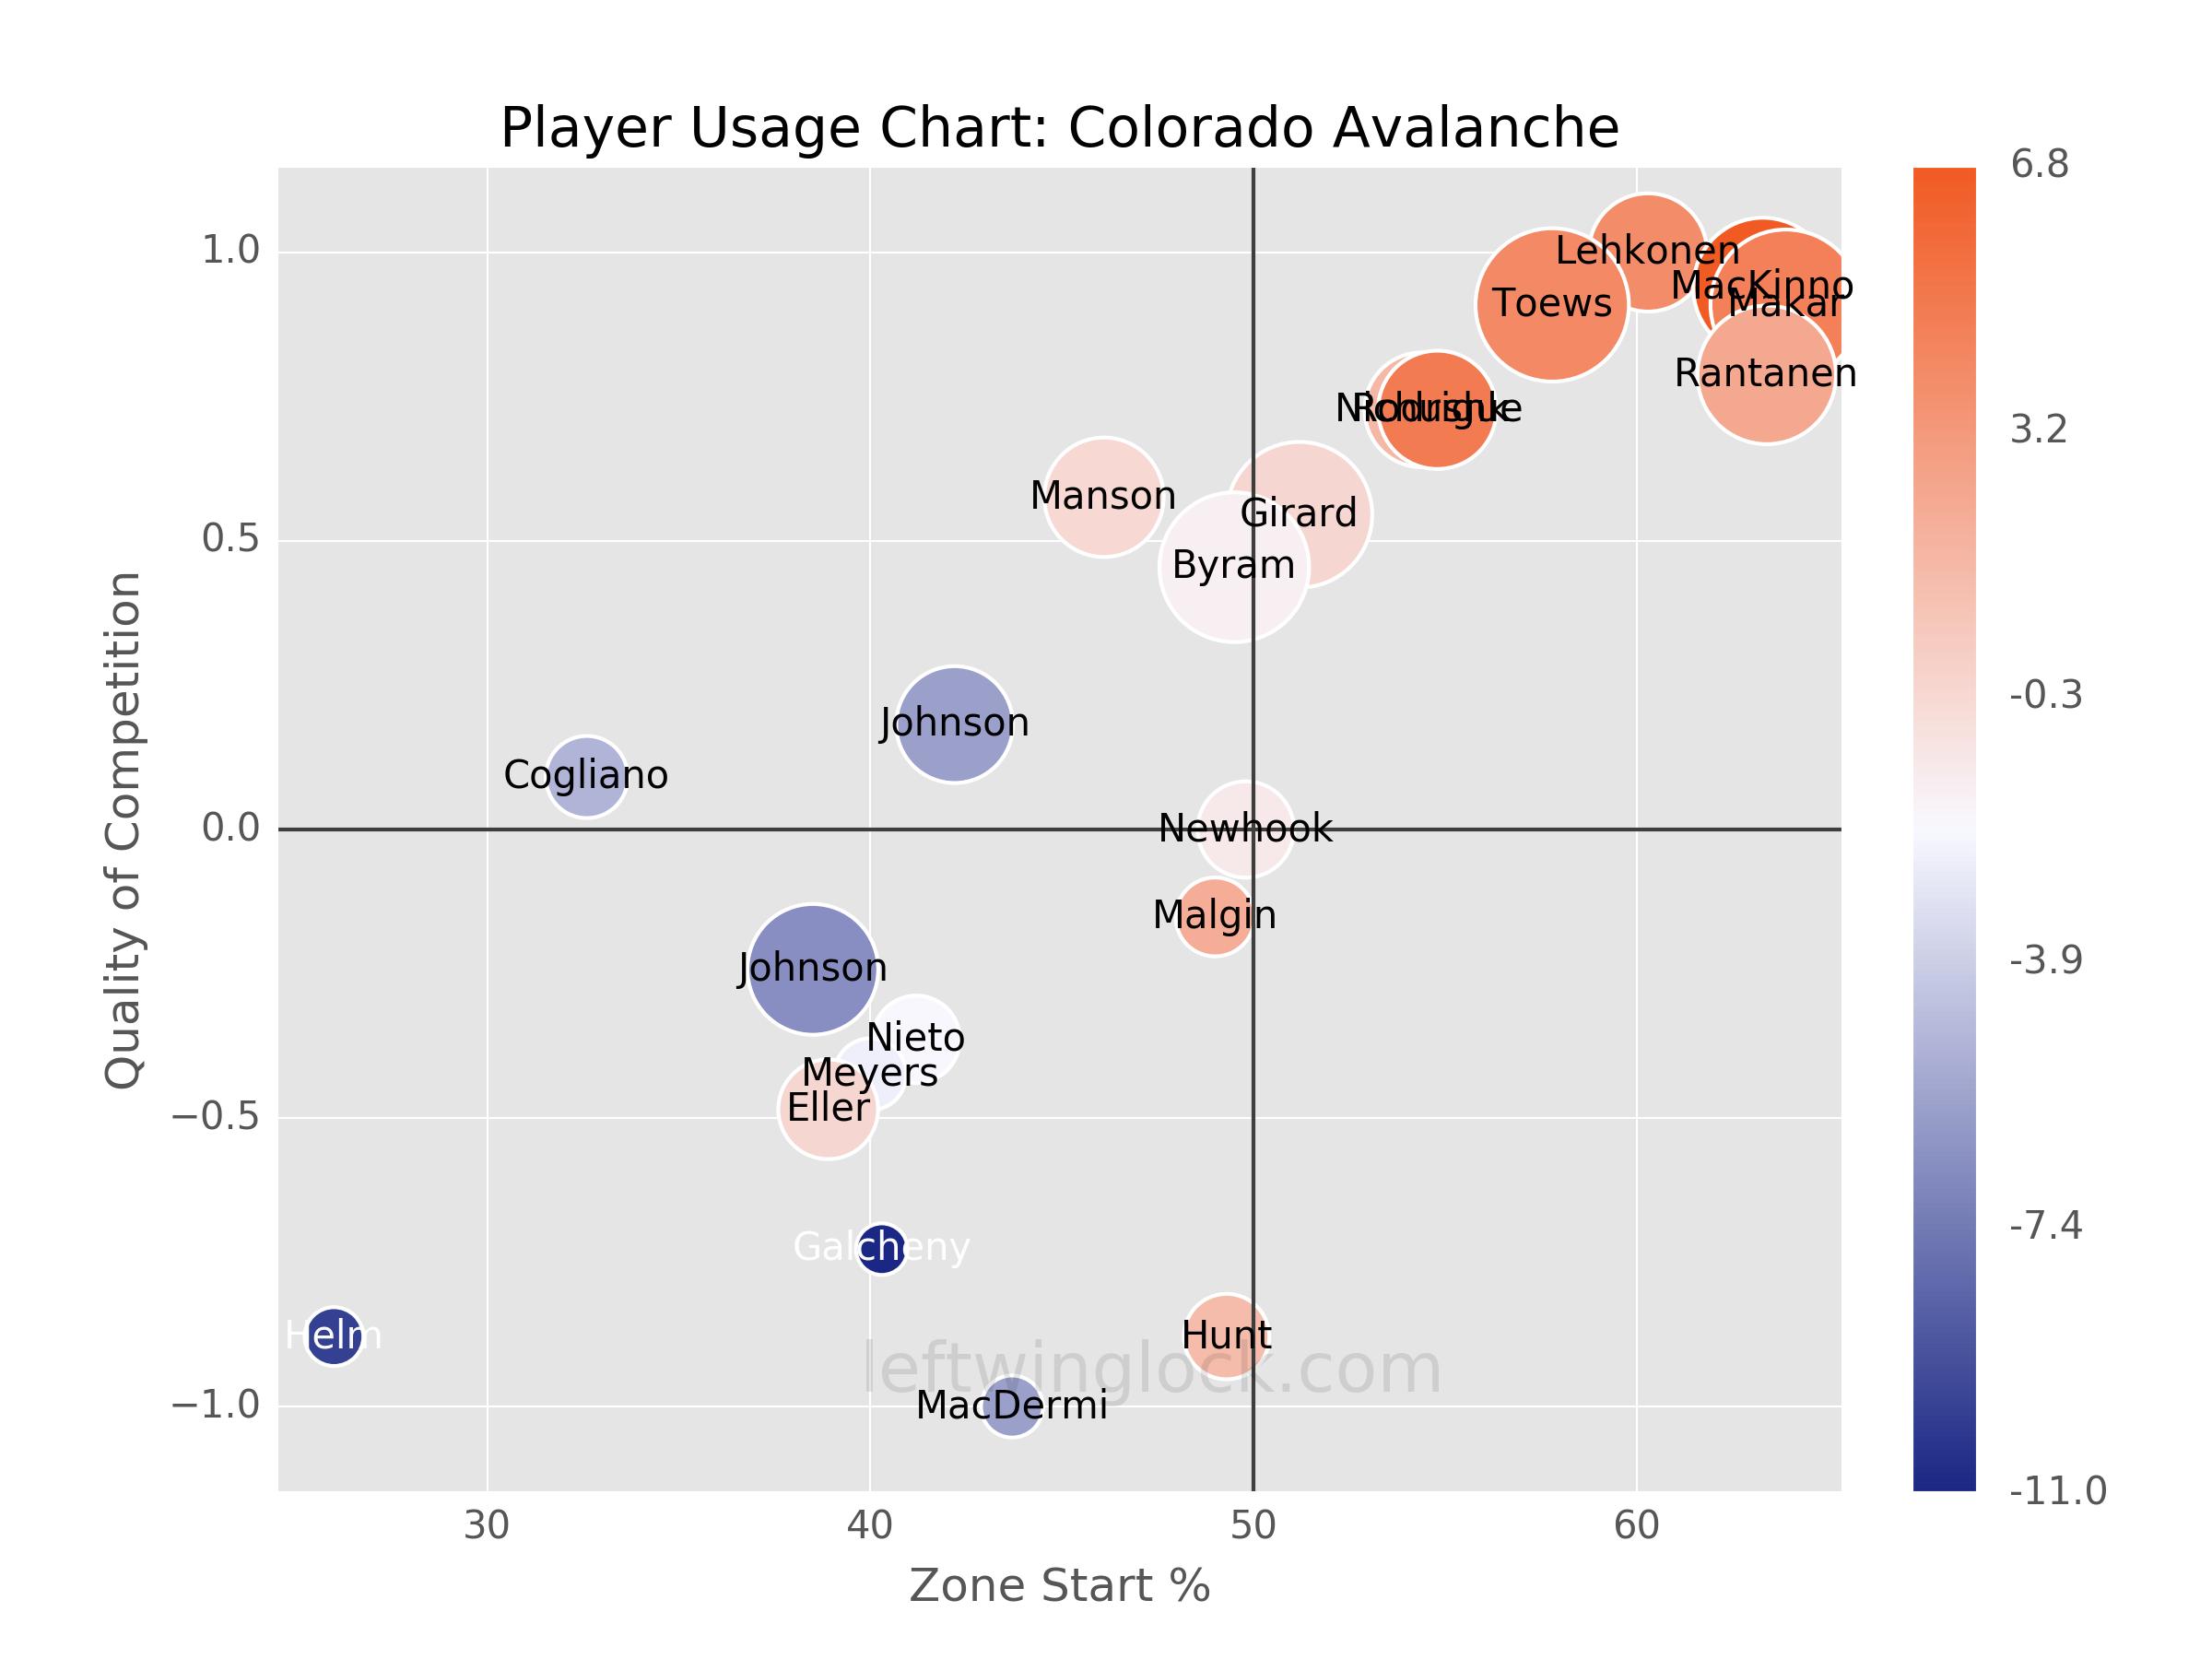 Colorado Avalanche Player Usage Chart